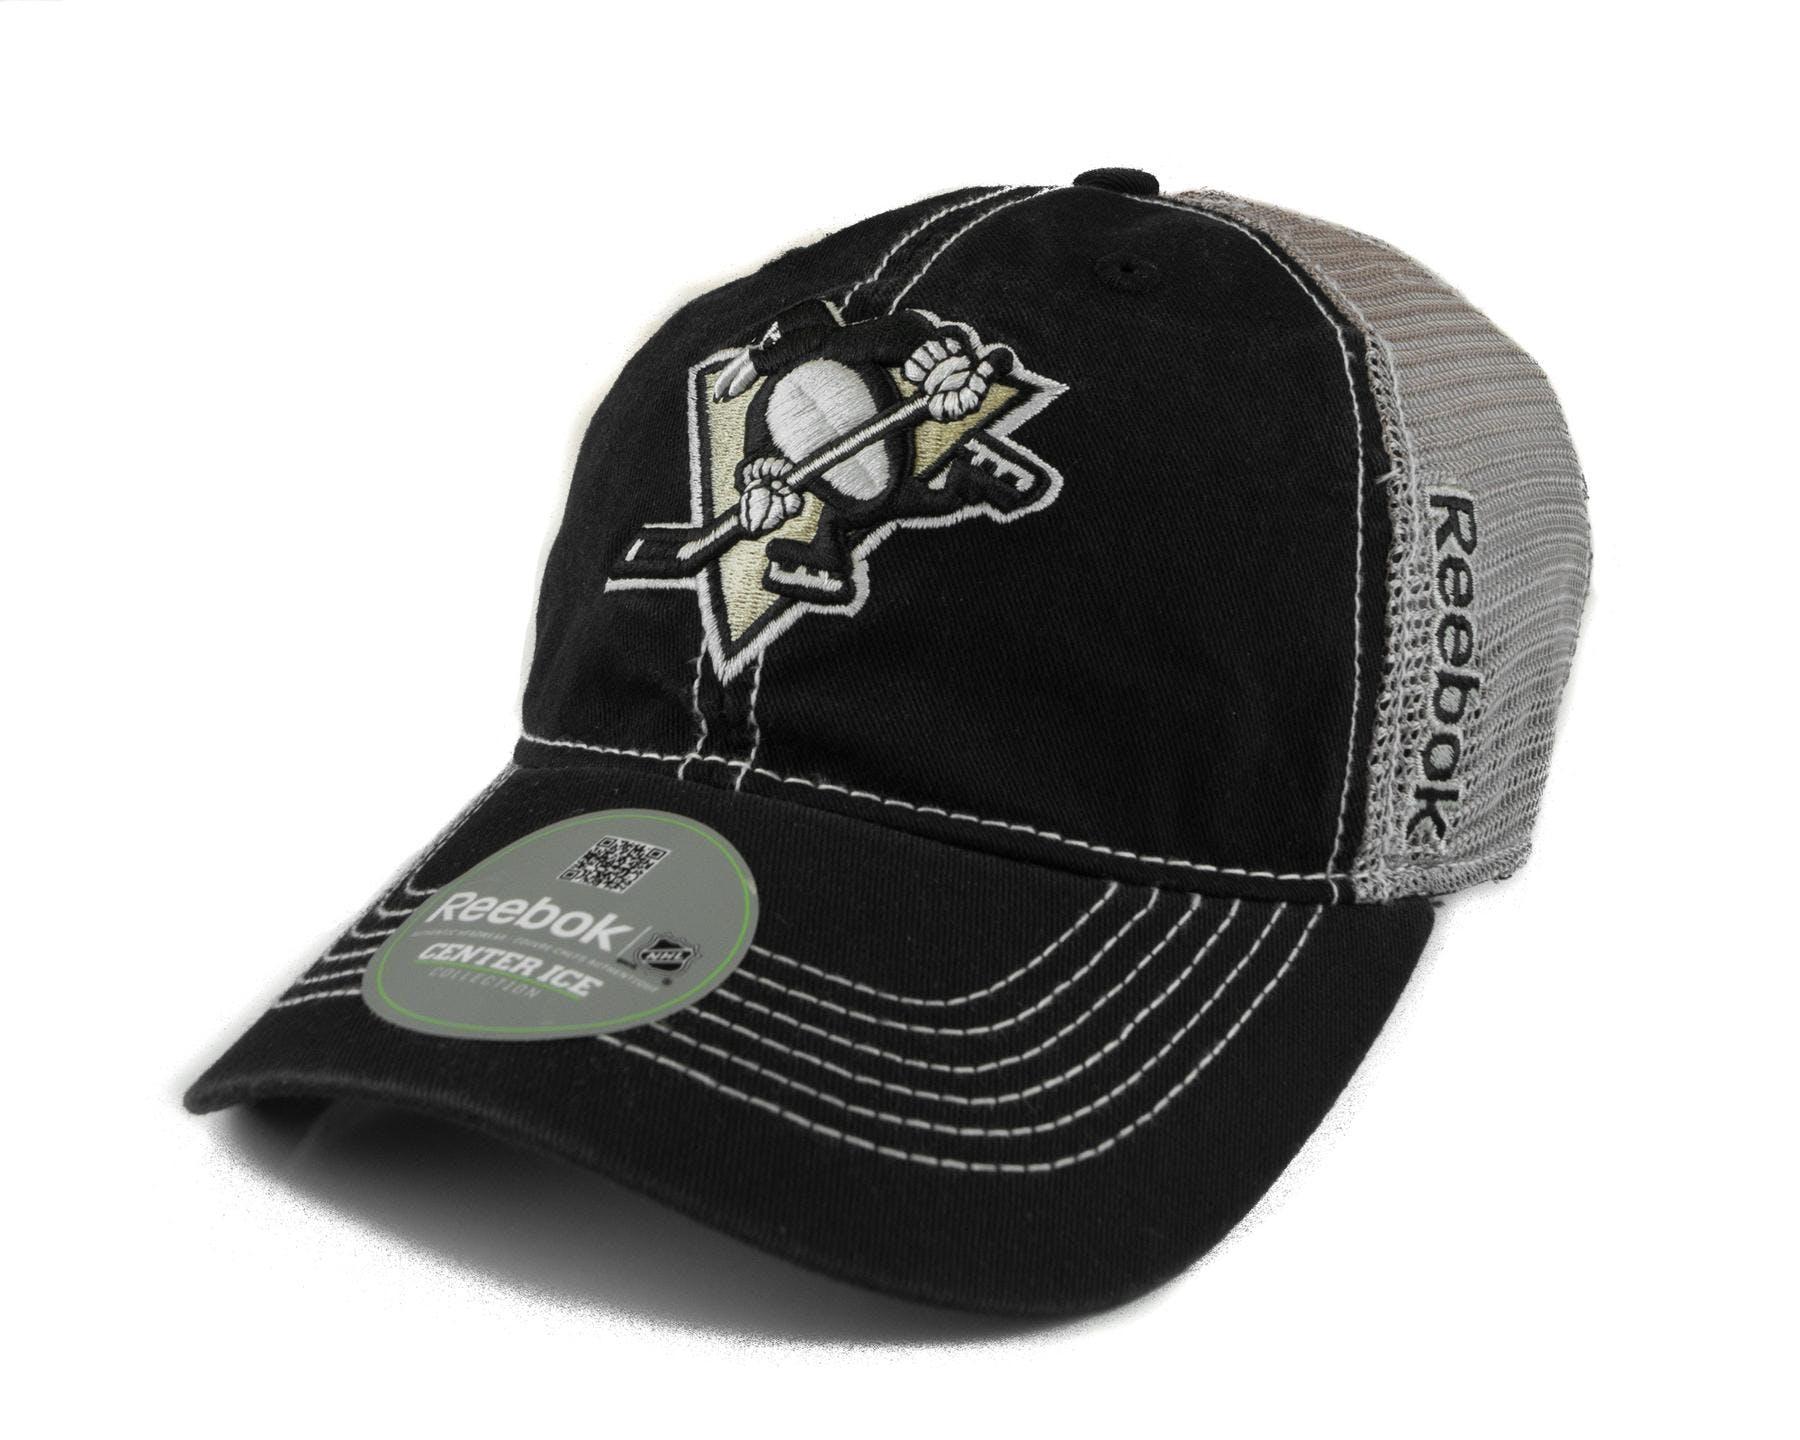 d607de1f946 Pittsburgh Penguins Reebok Black Grey Cotton Cap Fitted Hat